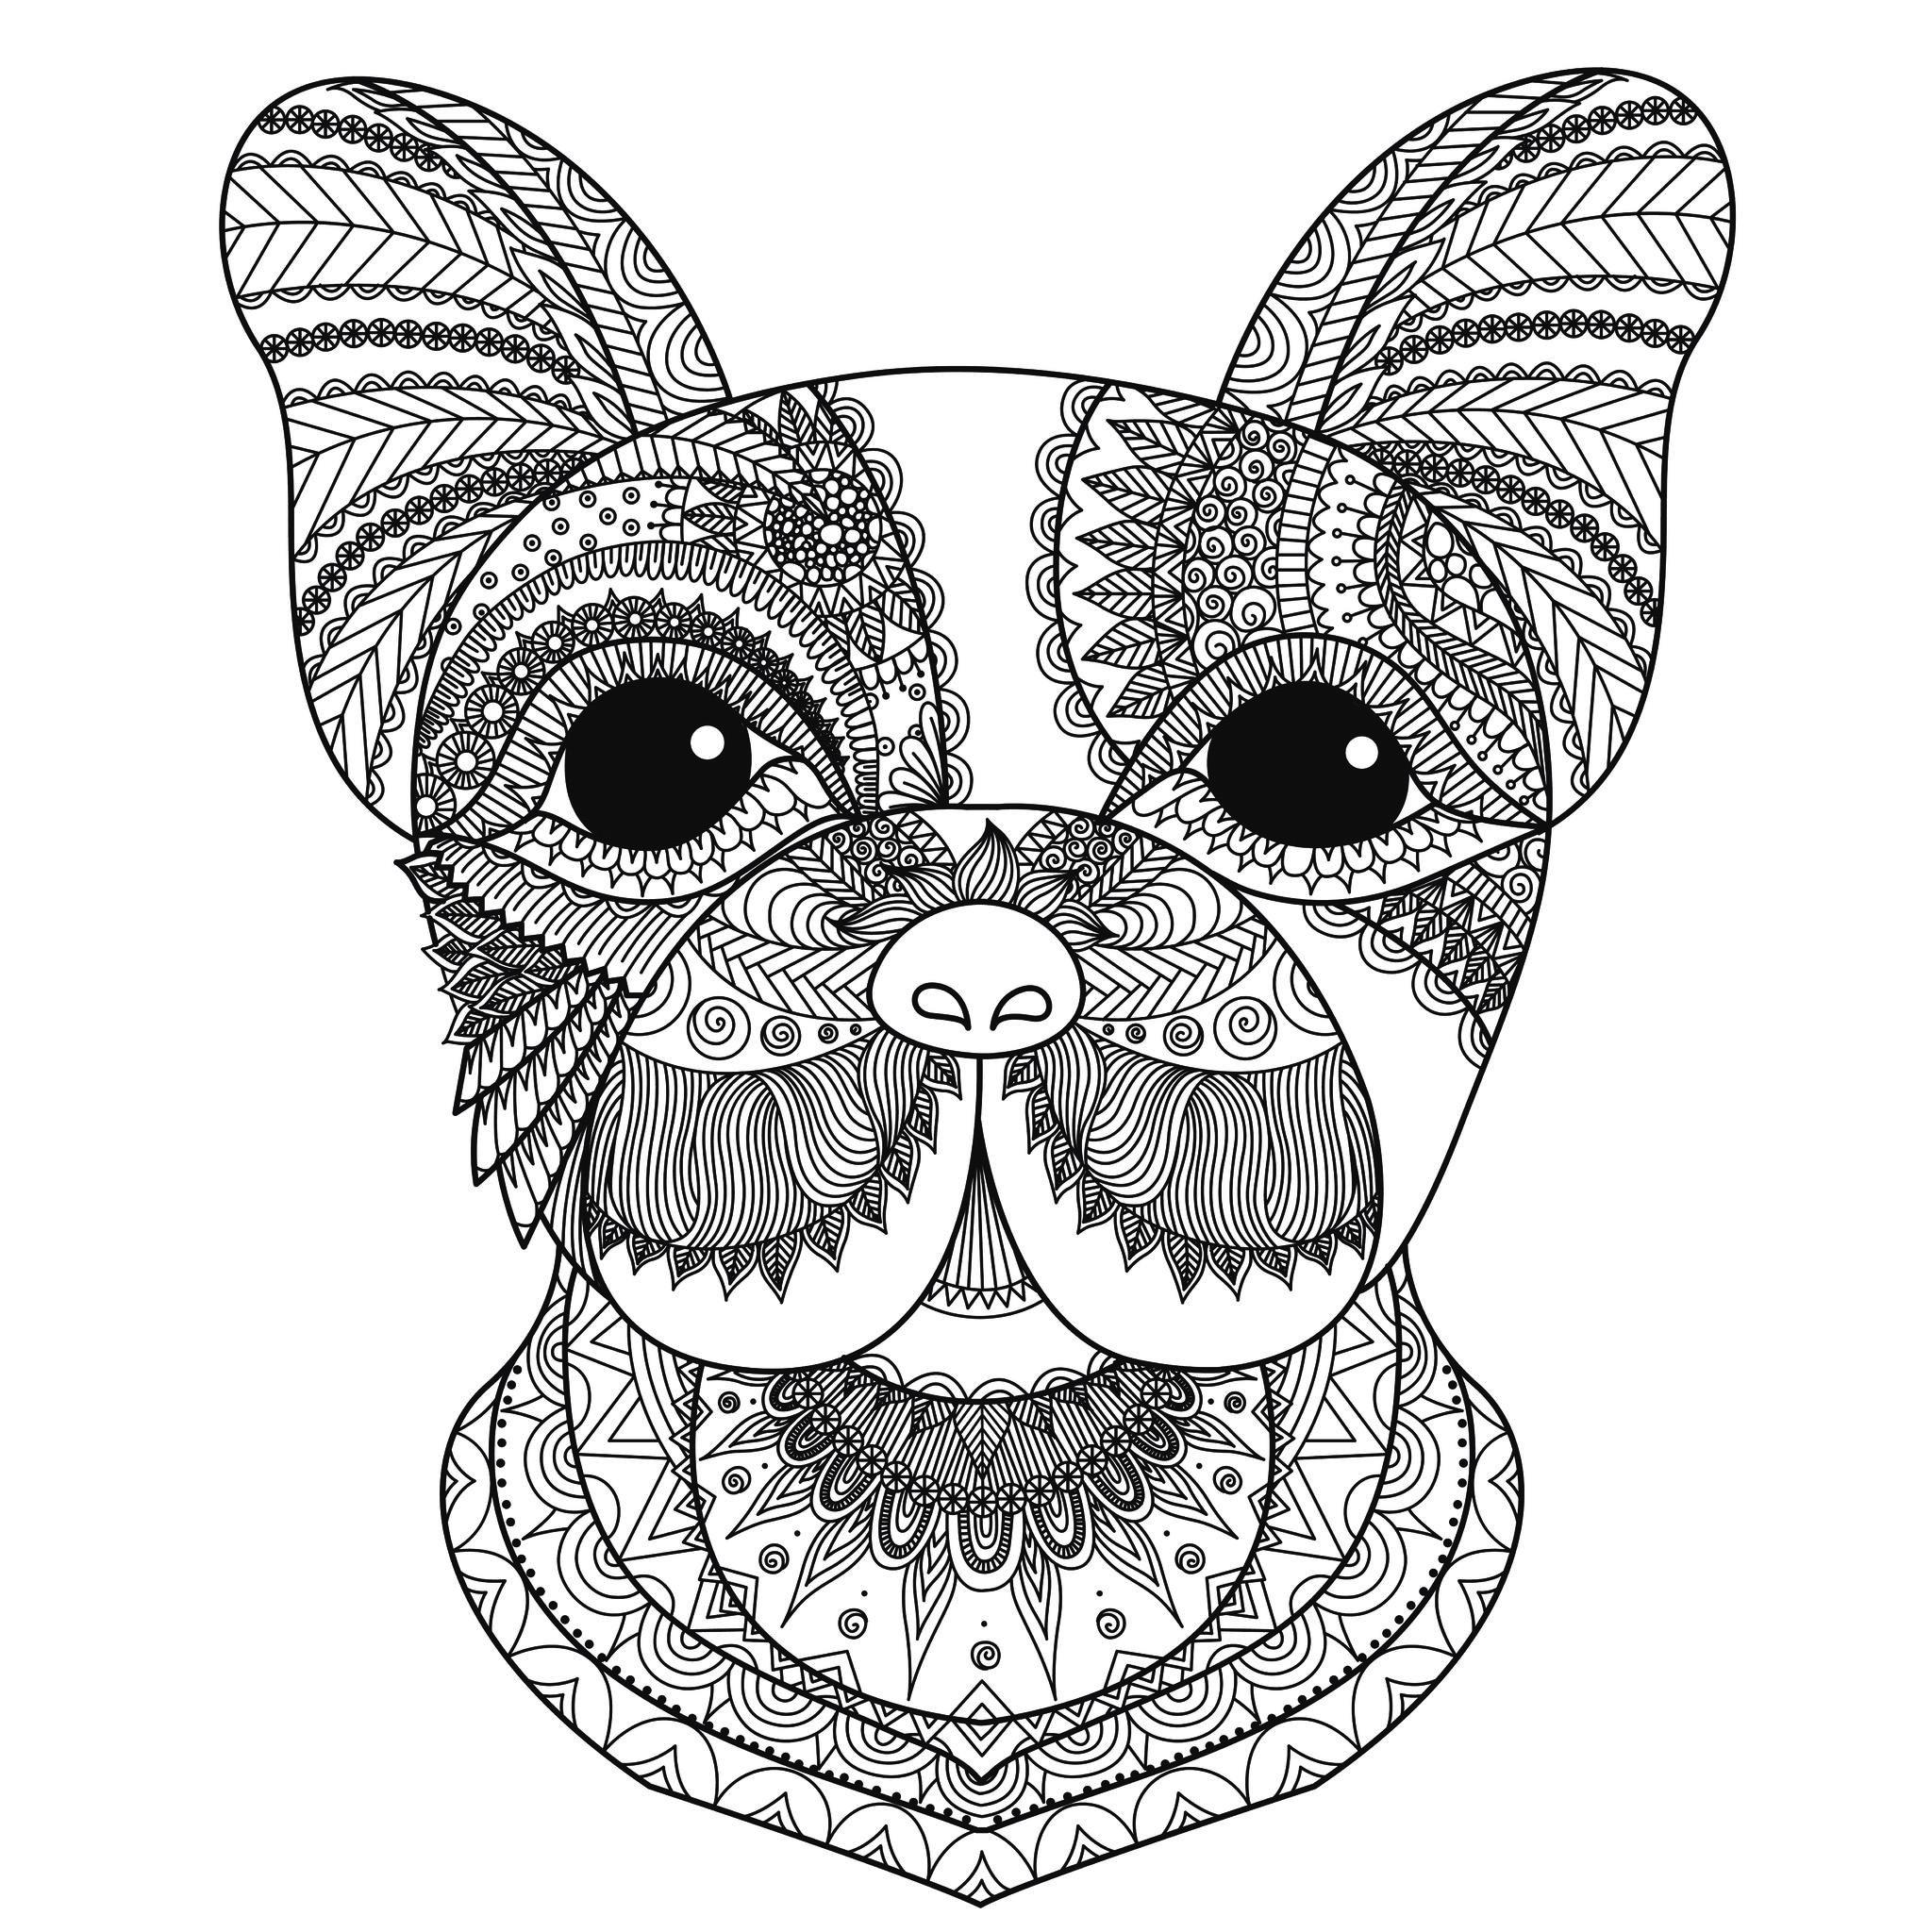 Tete de chien bimdeedee animaux coloriages difficiles - Dessin tete de chien ...